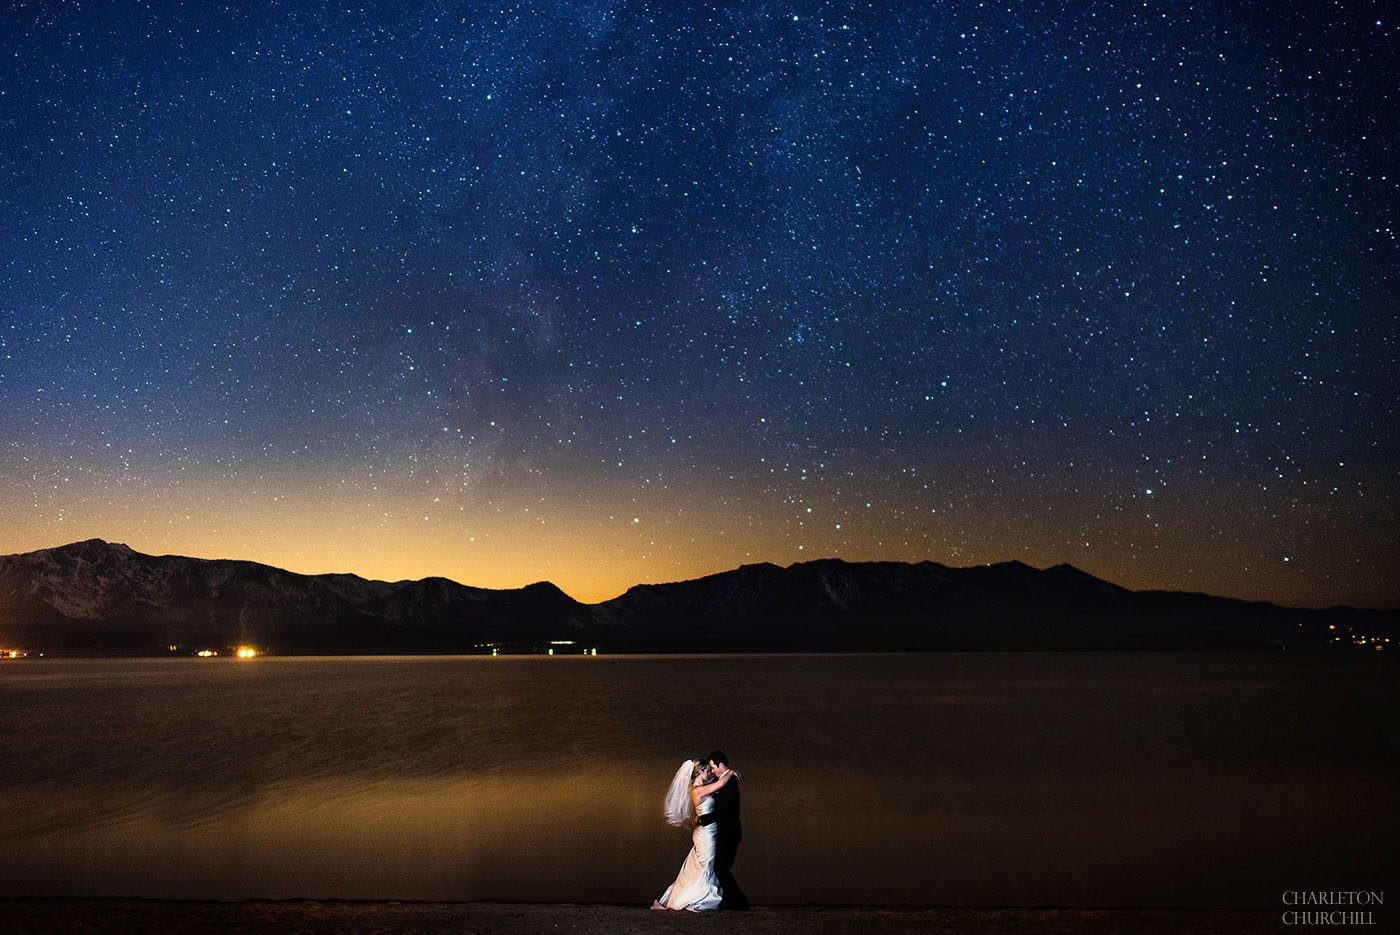 edgewood tahoe resort wedding photo of couple under the stars on the beach